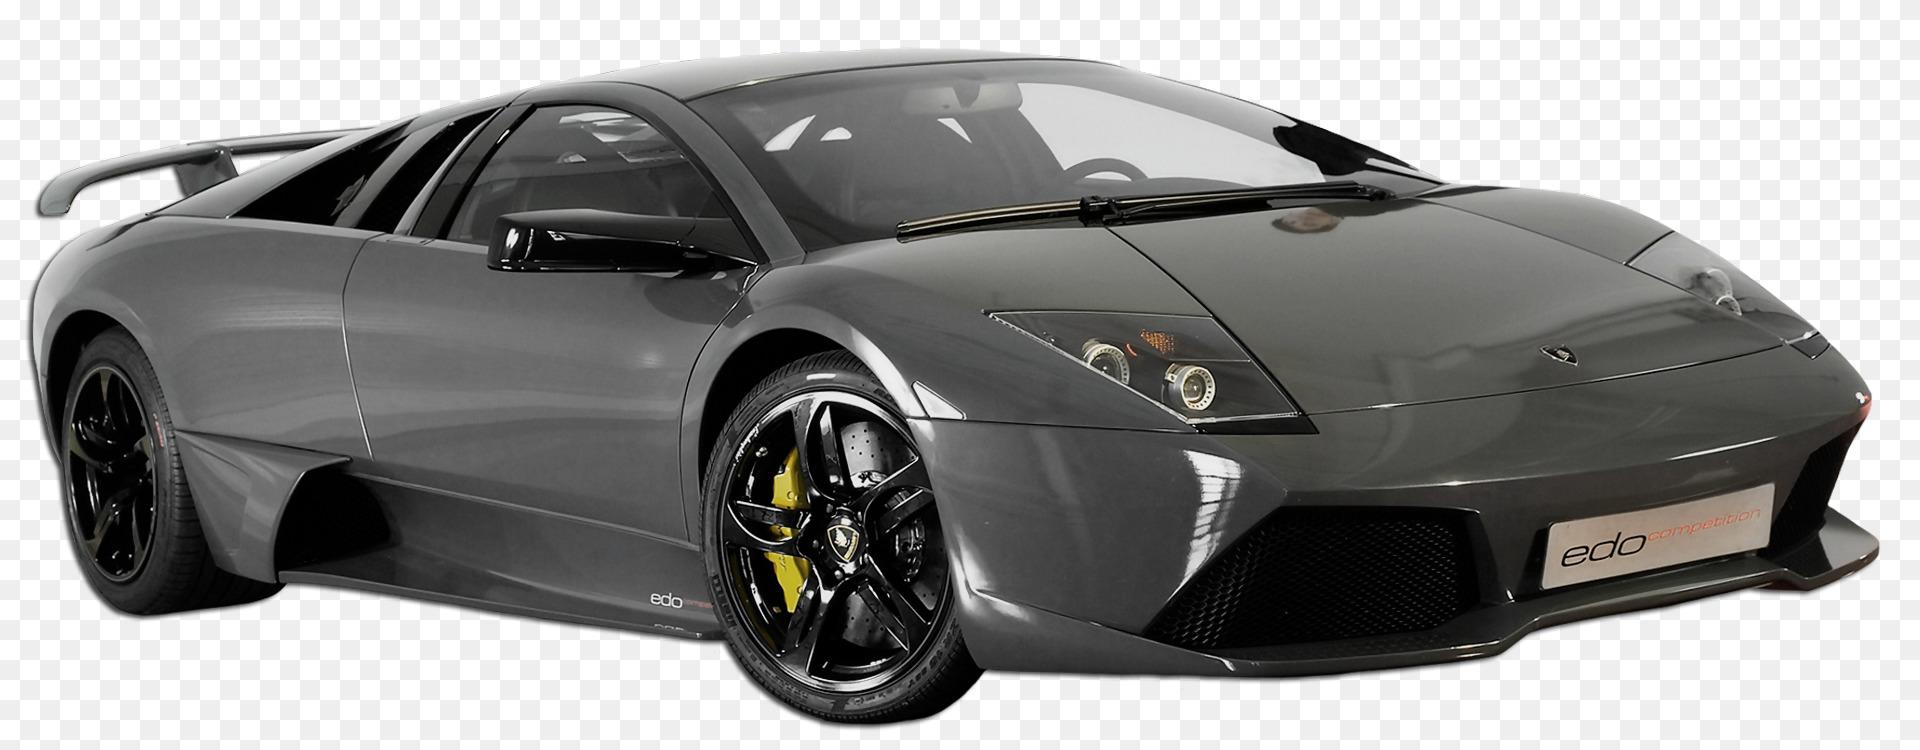 Car Lamborghini Bugatti Veyron Bmw M6 Holden Monaro Cc0 Wheel